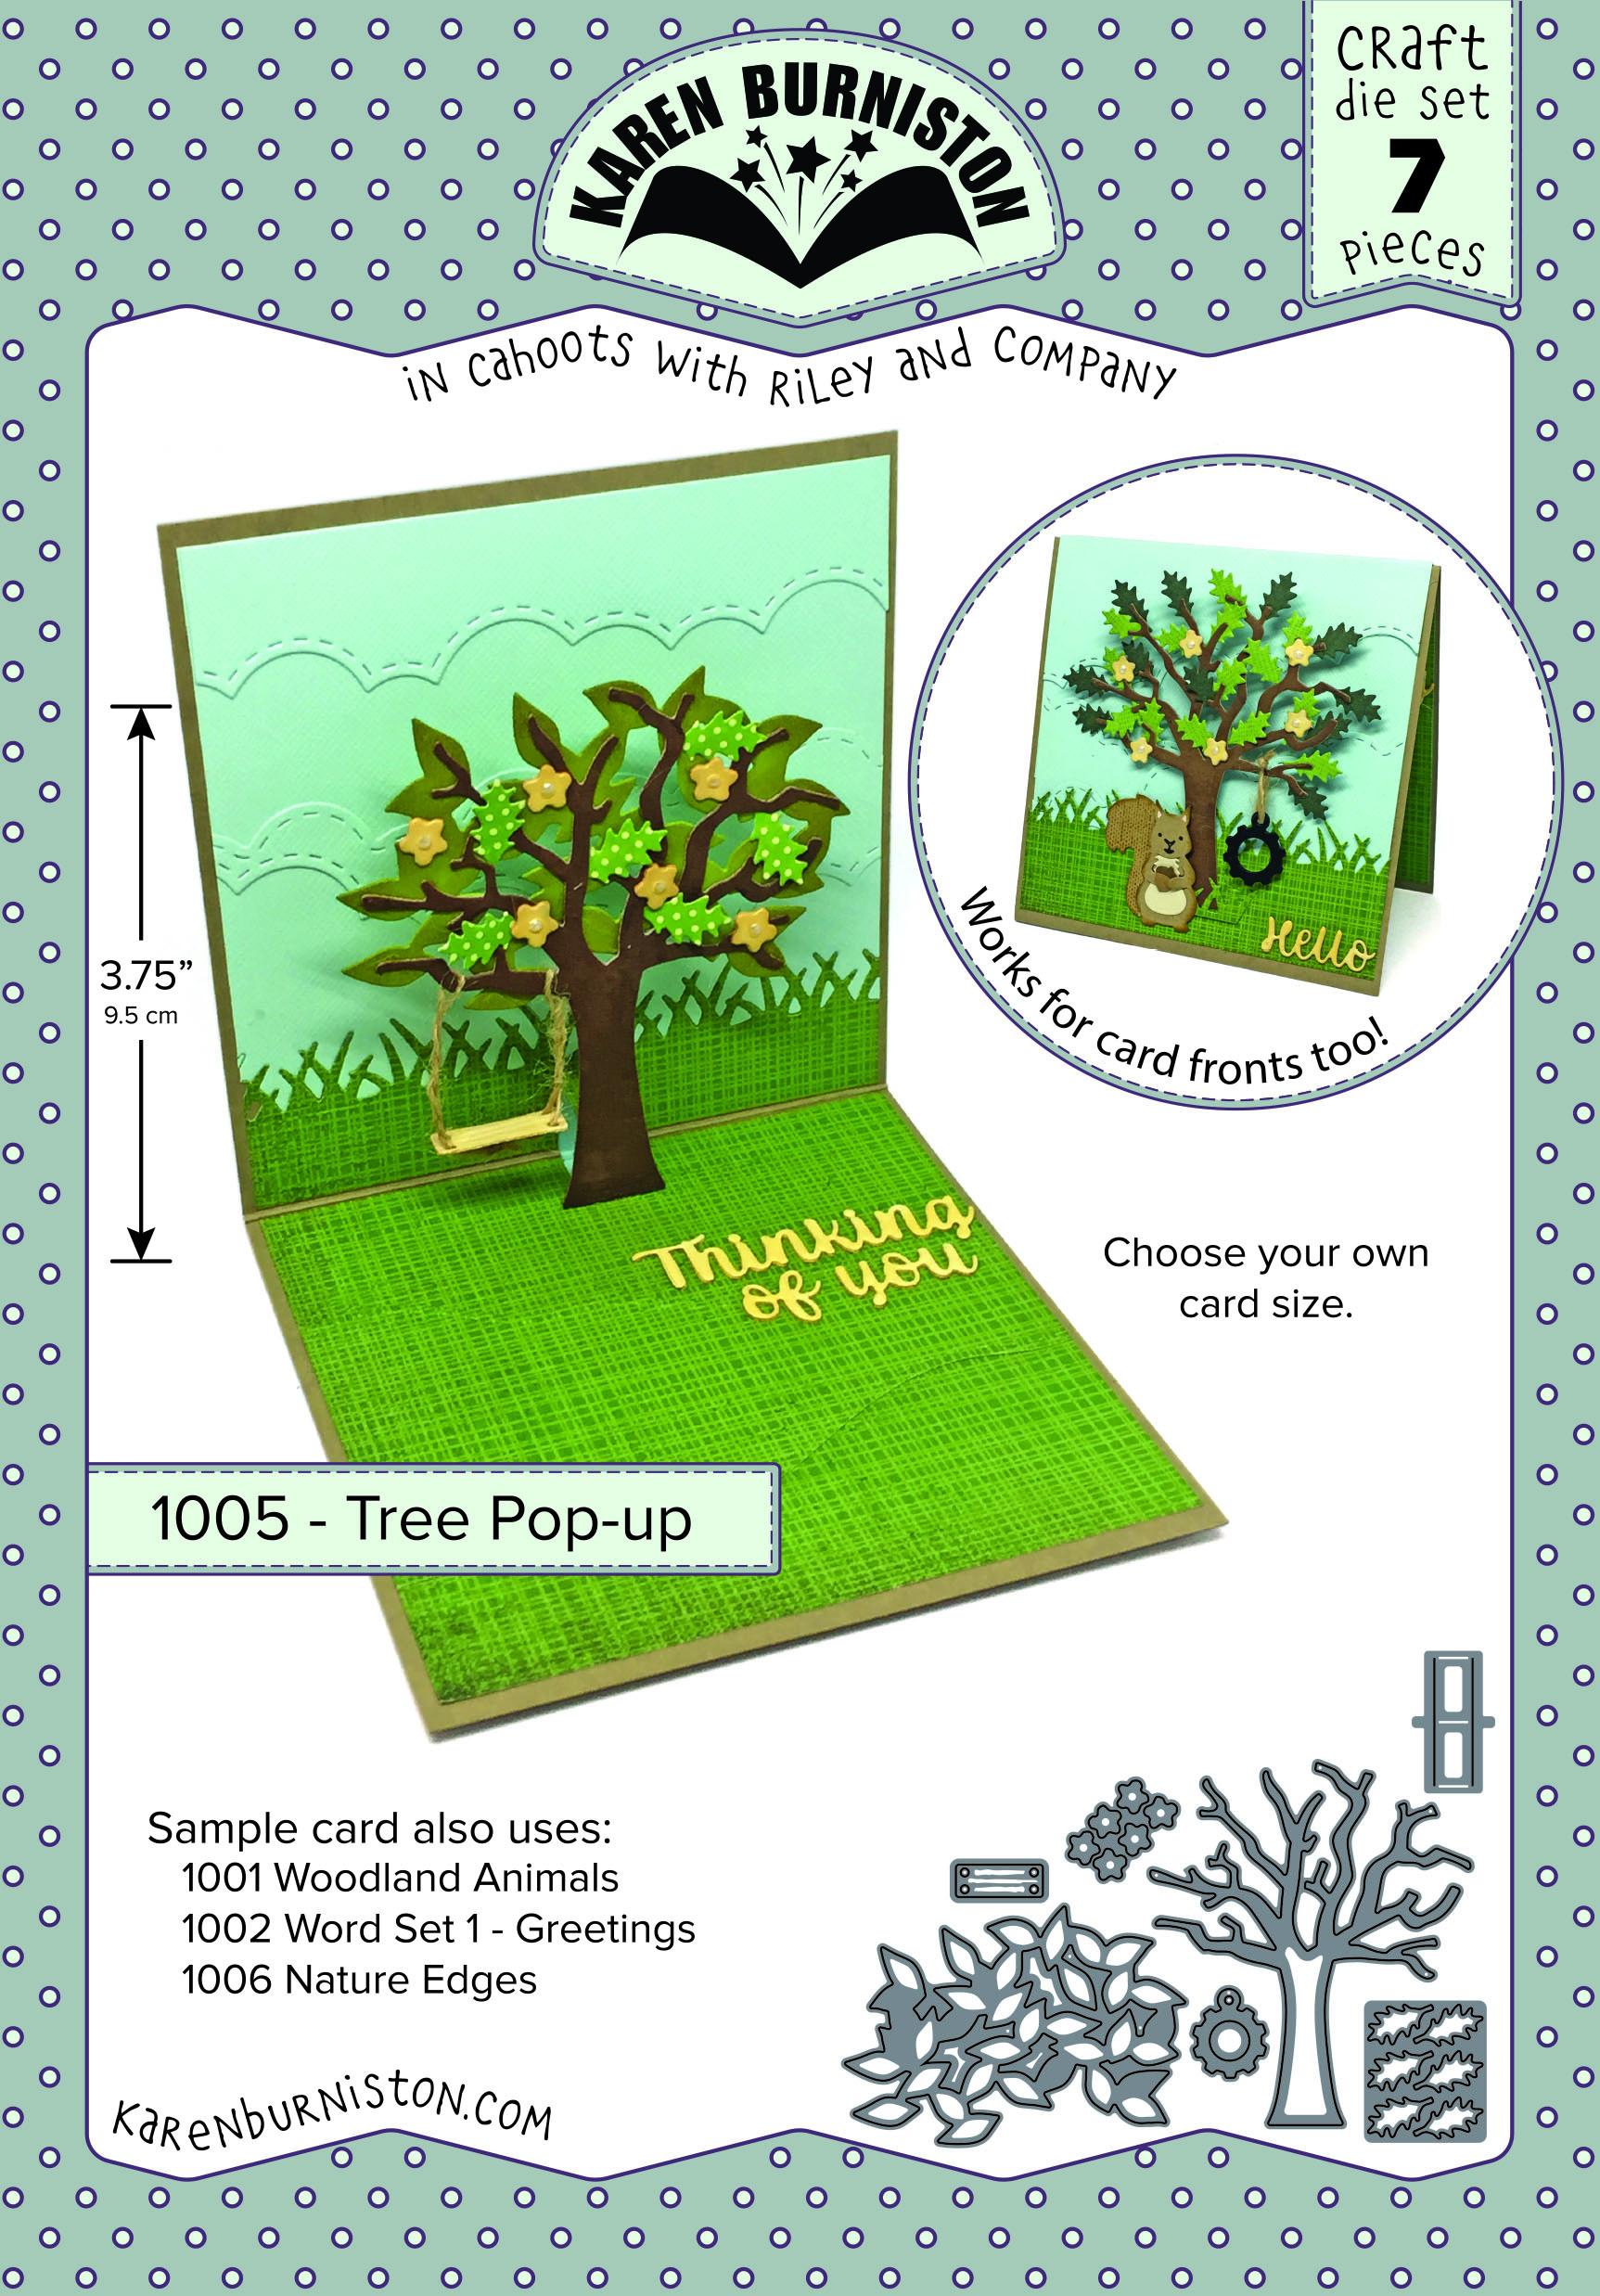 1005-treepopup.jpg